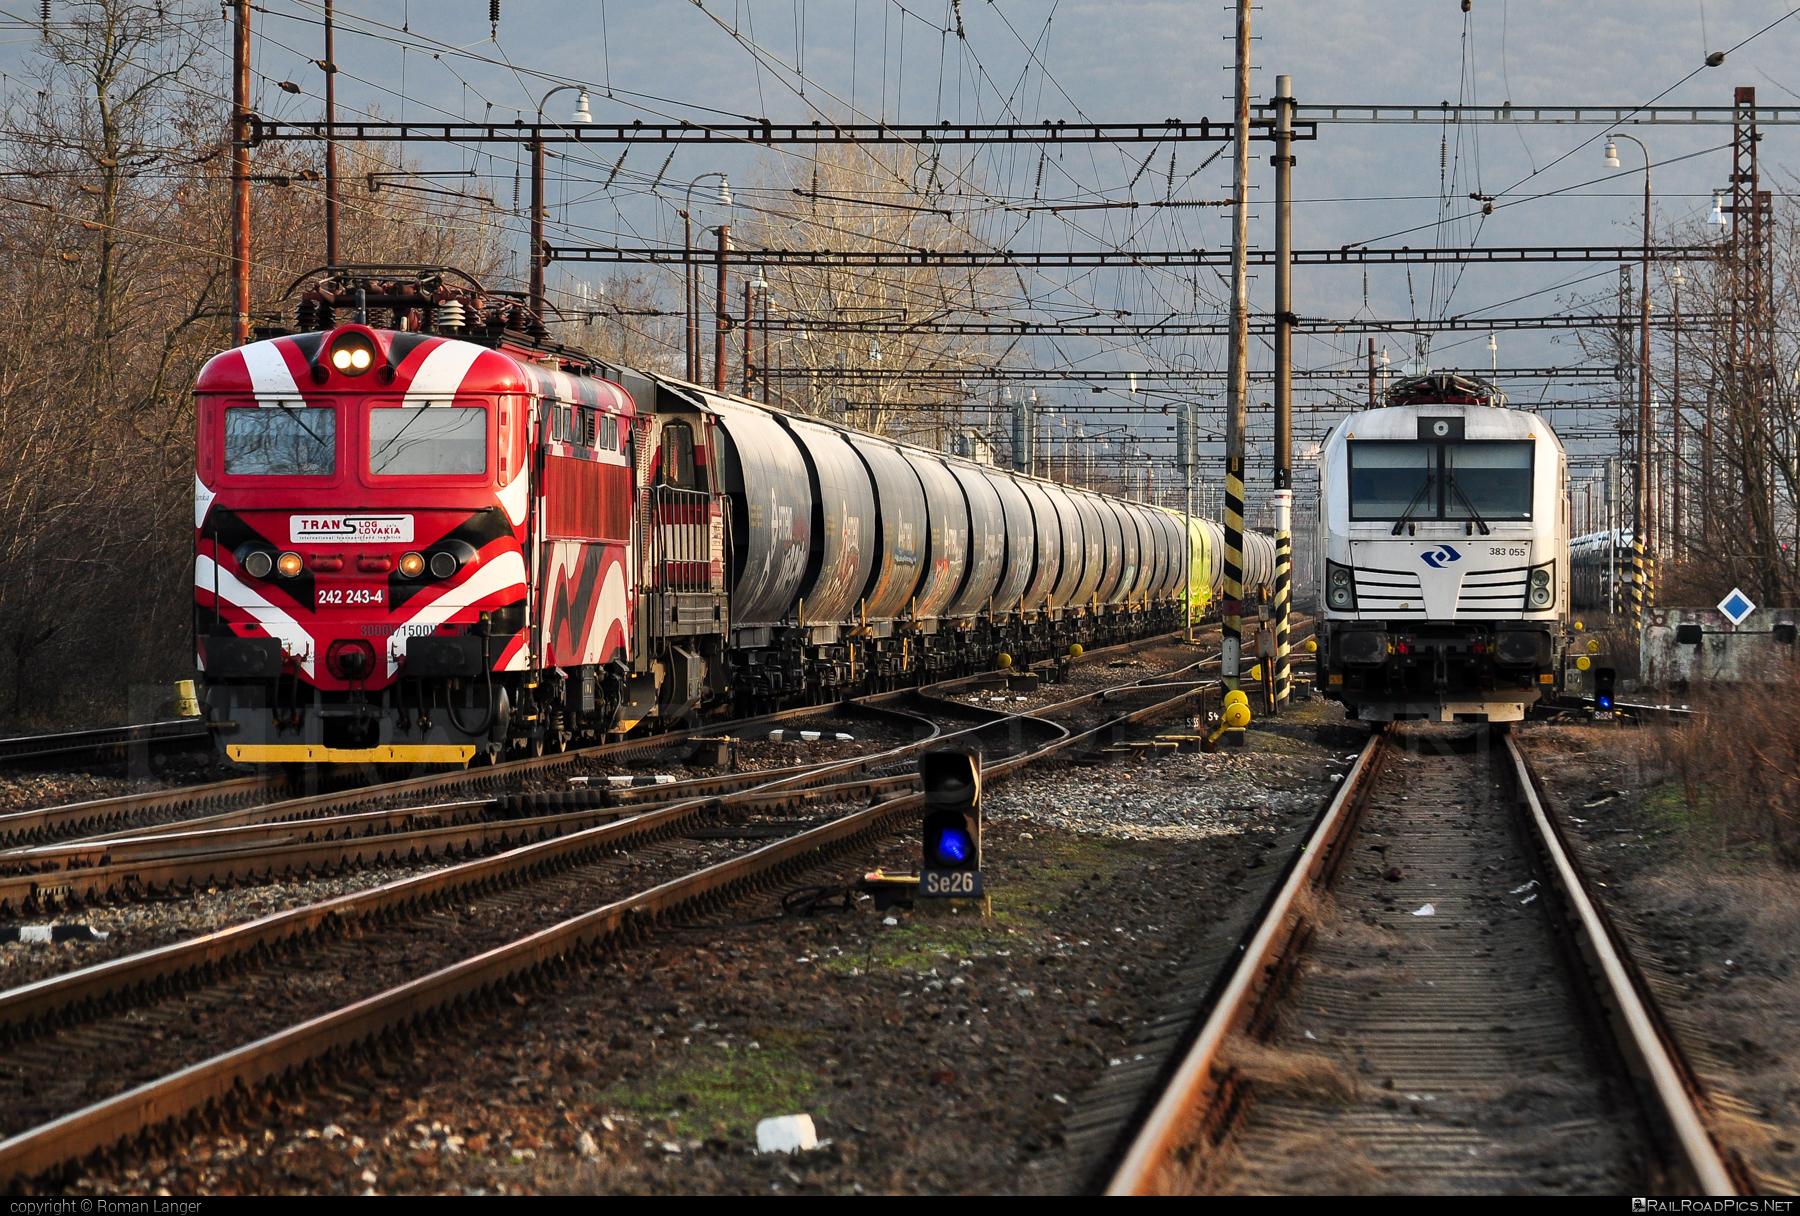 Škoda 73E - 242 243-4 operated by PETROLSPED Slovakia s.r.o. #locomotive242 #petrolsped #plechac #skoda #skoda73e #tlssk #translog #translogslovakia